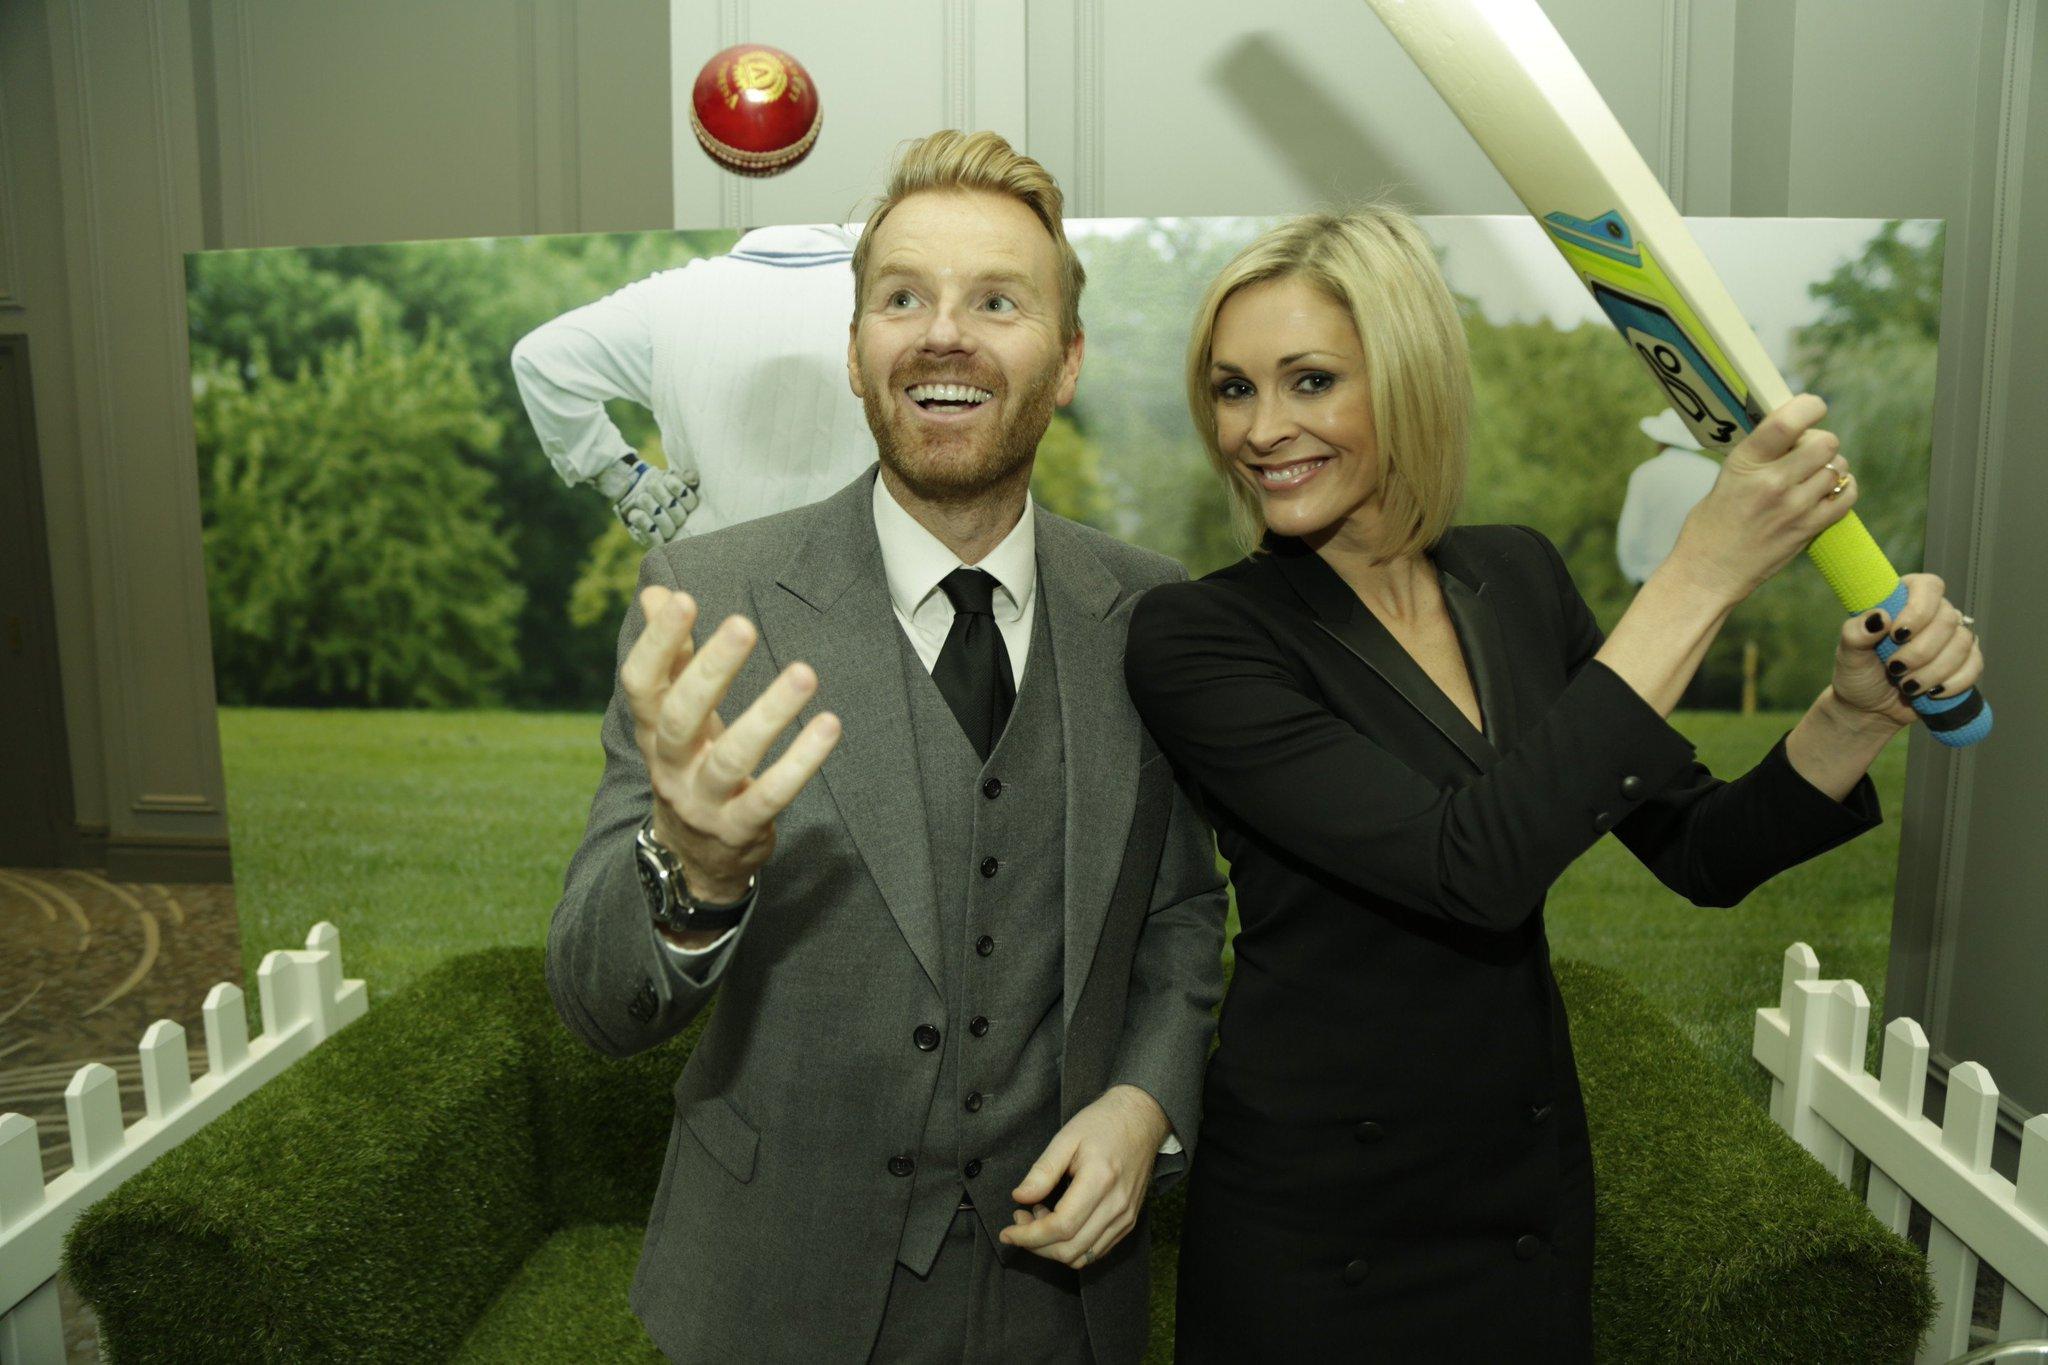 RT @PrideofSport: Sporty couple @Jennifalconer and James Midgley talk cricket! #prideofsport https://t.co/W0GfqFePn6